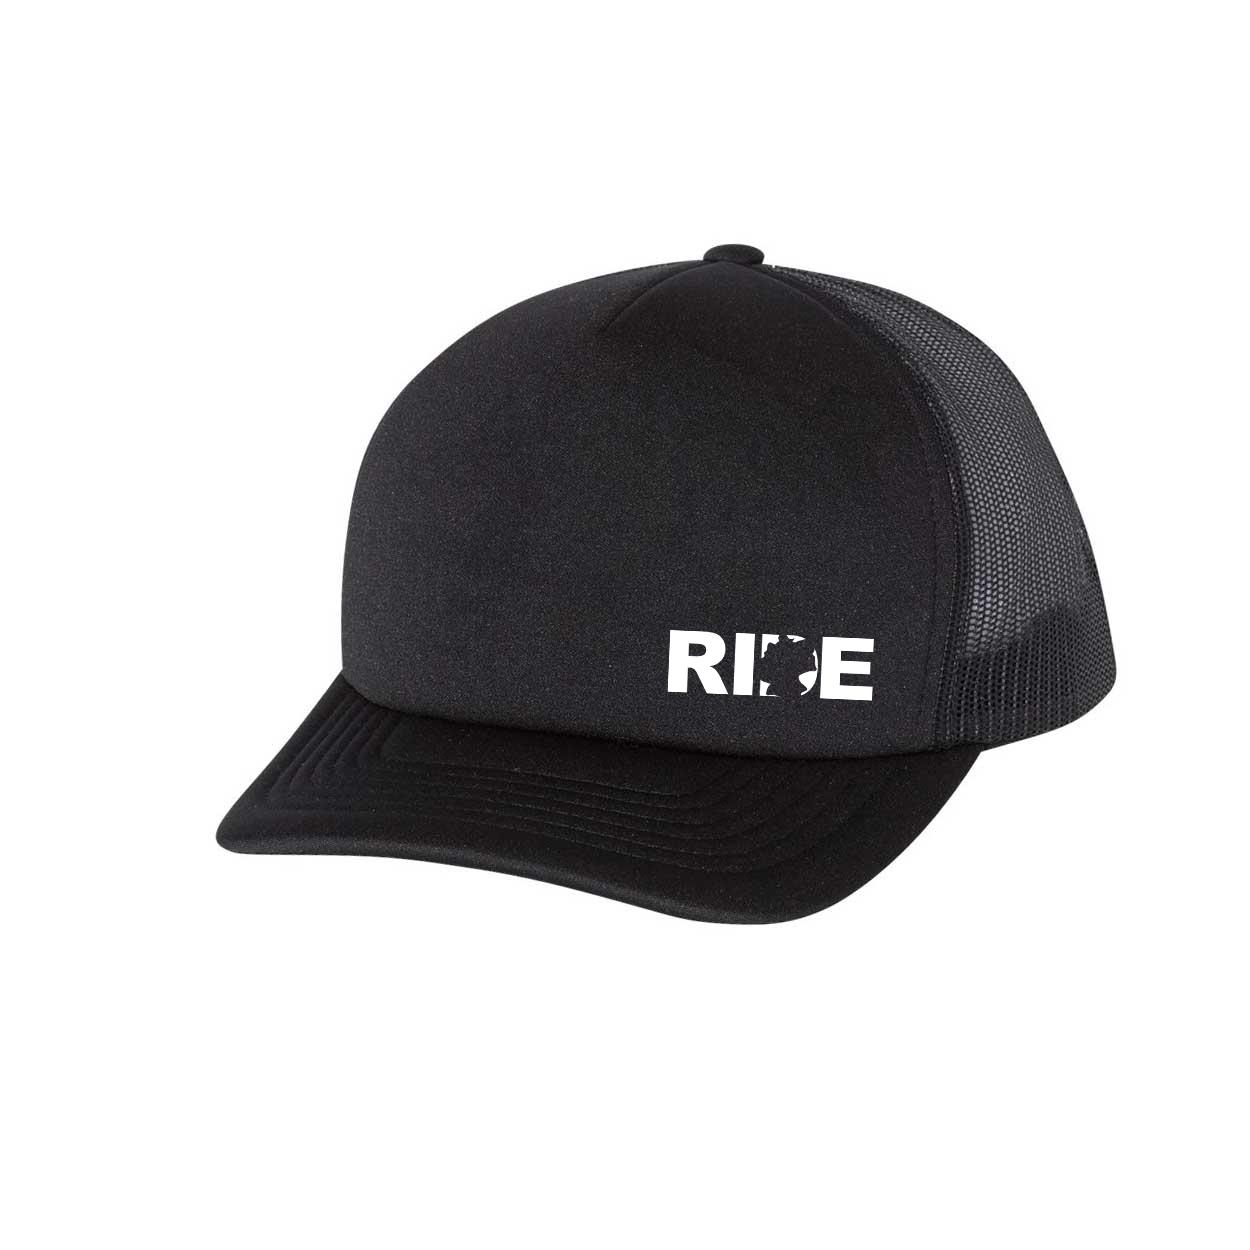 Ride Germany Night Out Premium Foam Trucker Snapback Hat Black (White Logo)